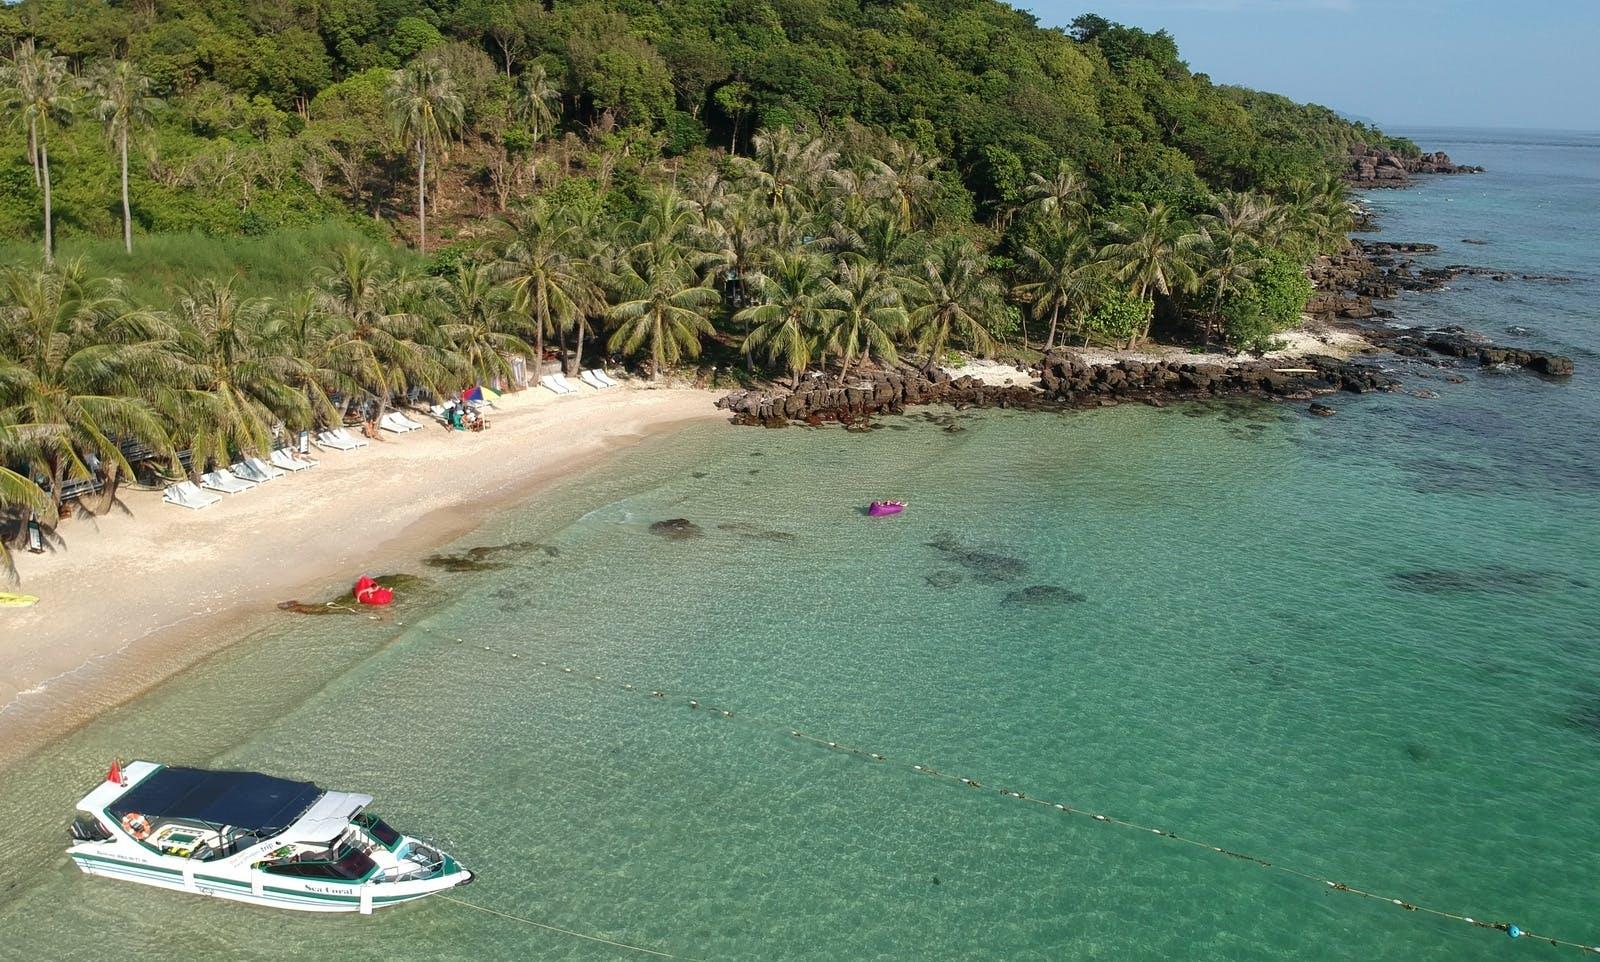 Cable car Thom island – Kho island – May Rut island – Buom island